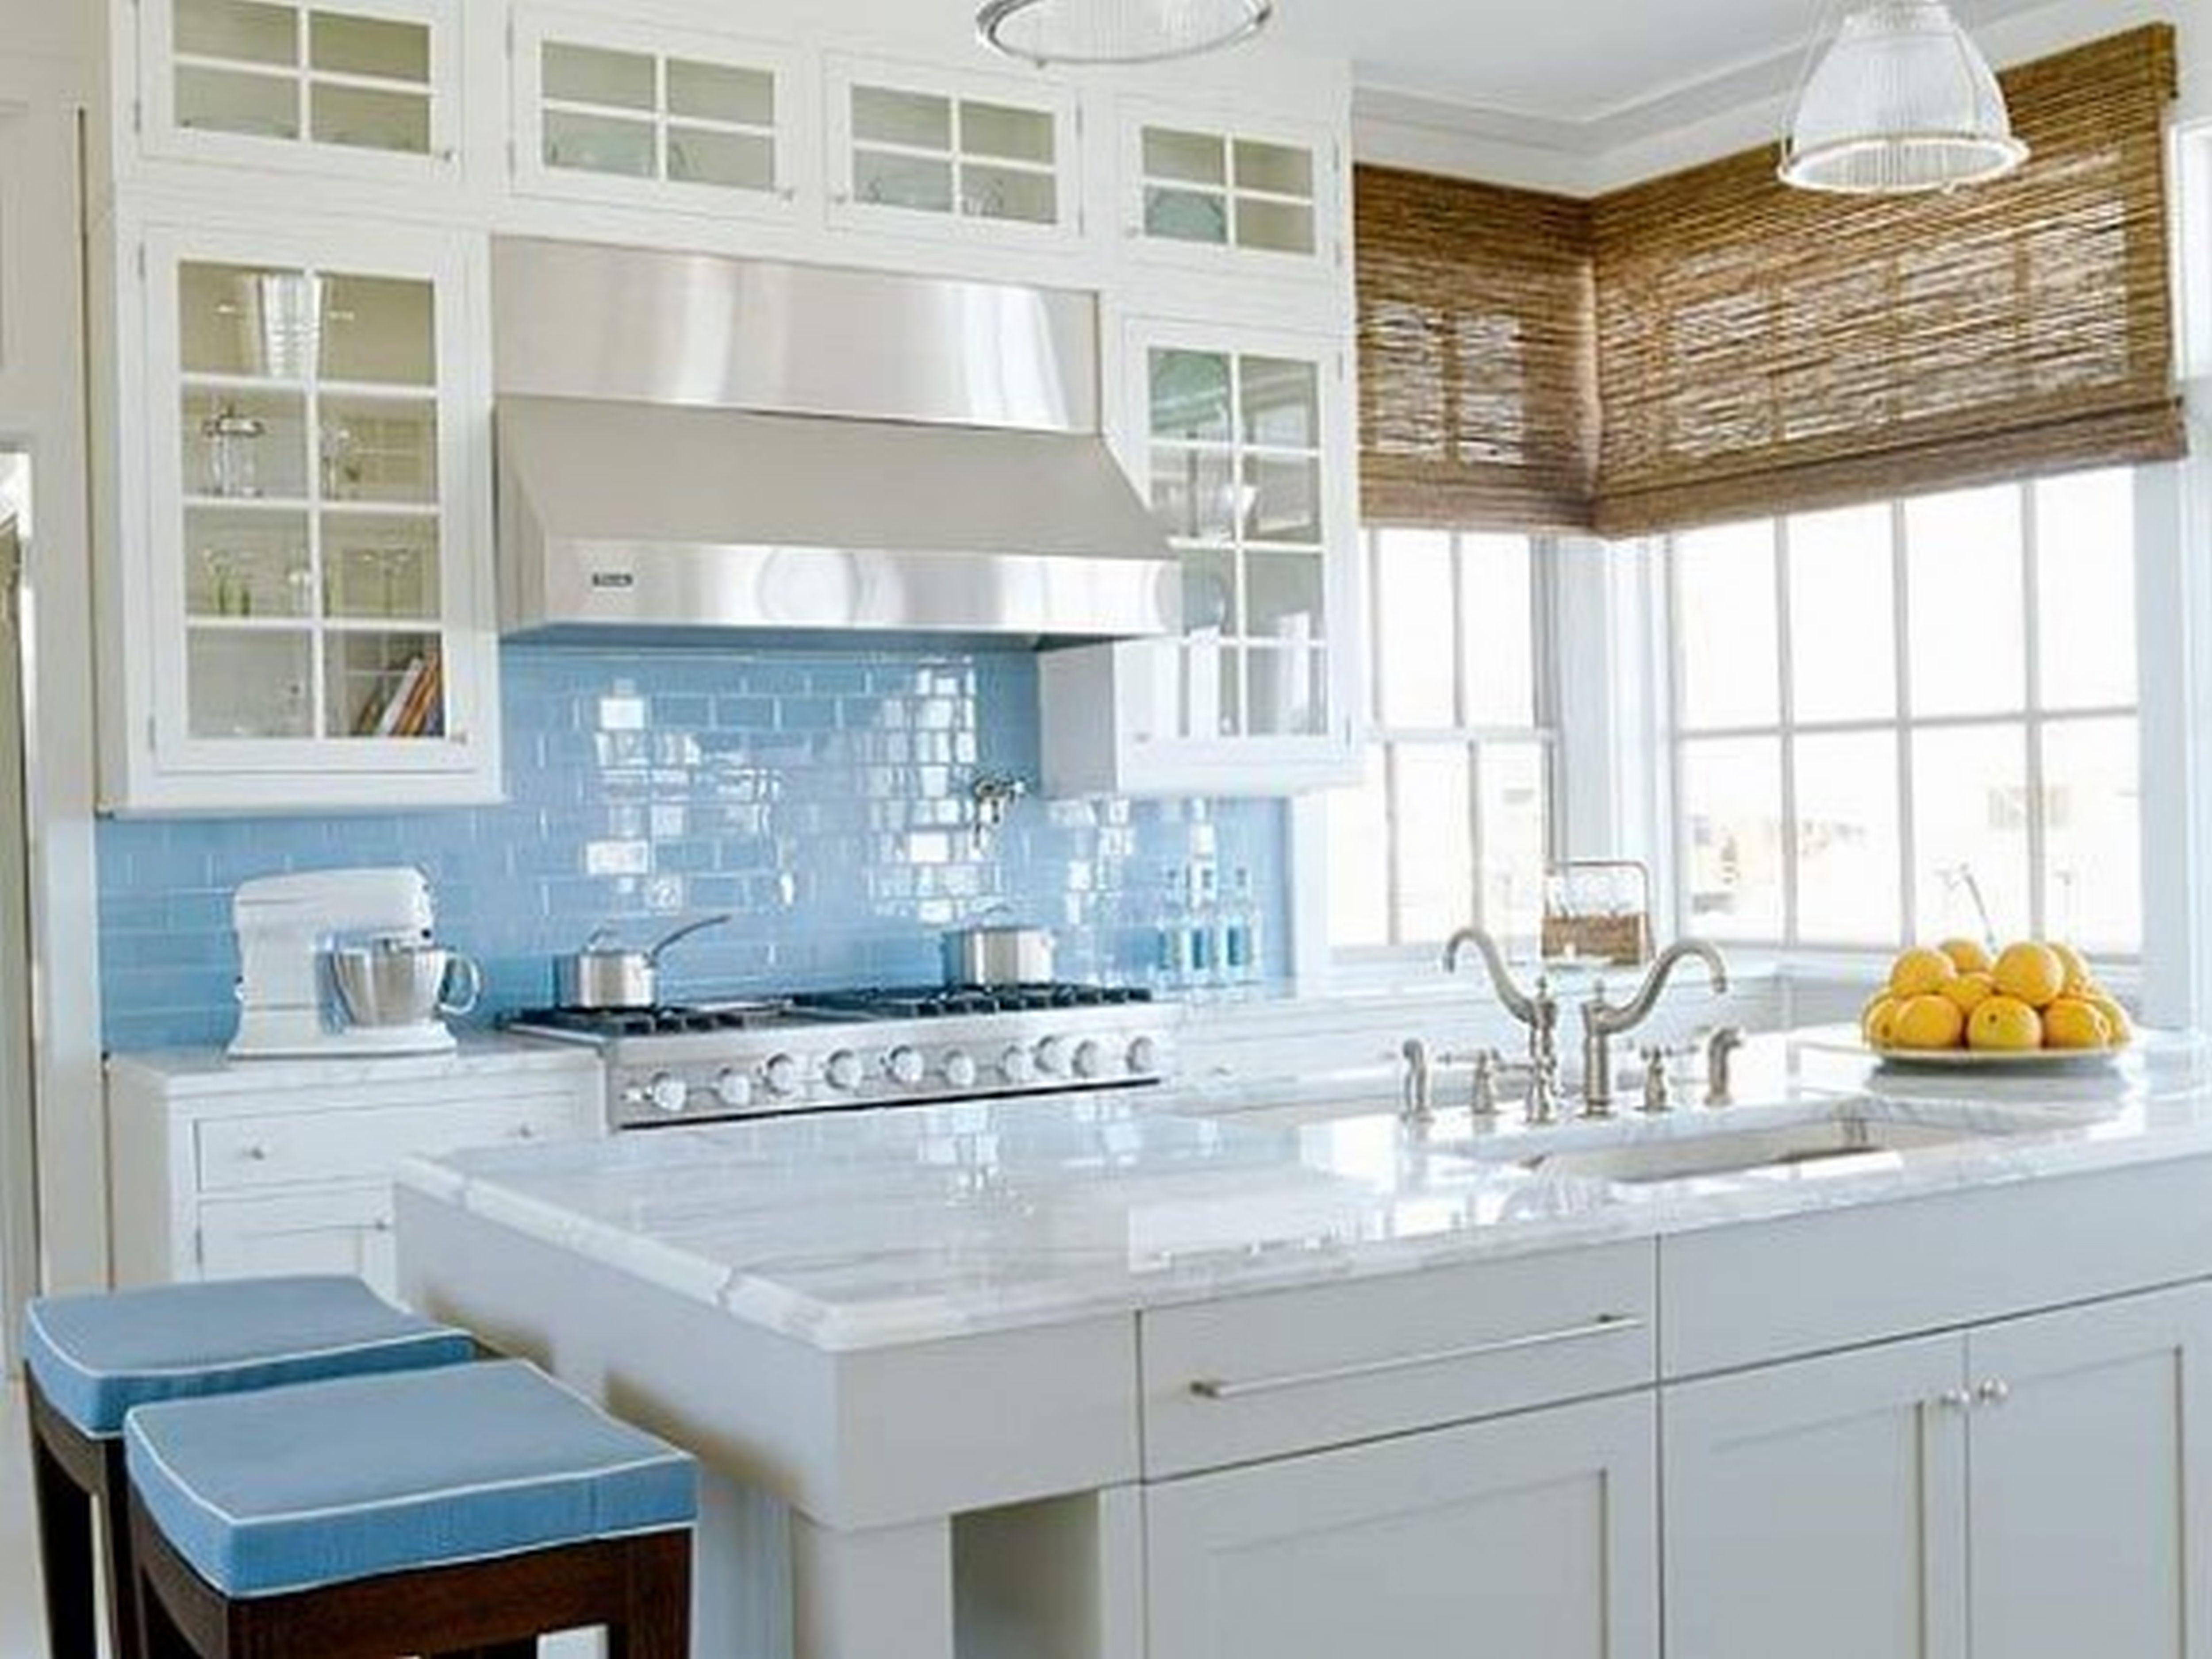 Blue Kitchen Wall Tile Ideas Kitchen Wall Tile Designs